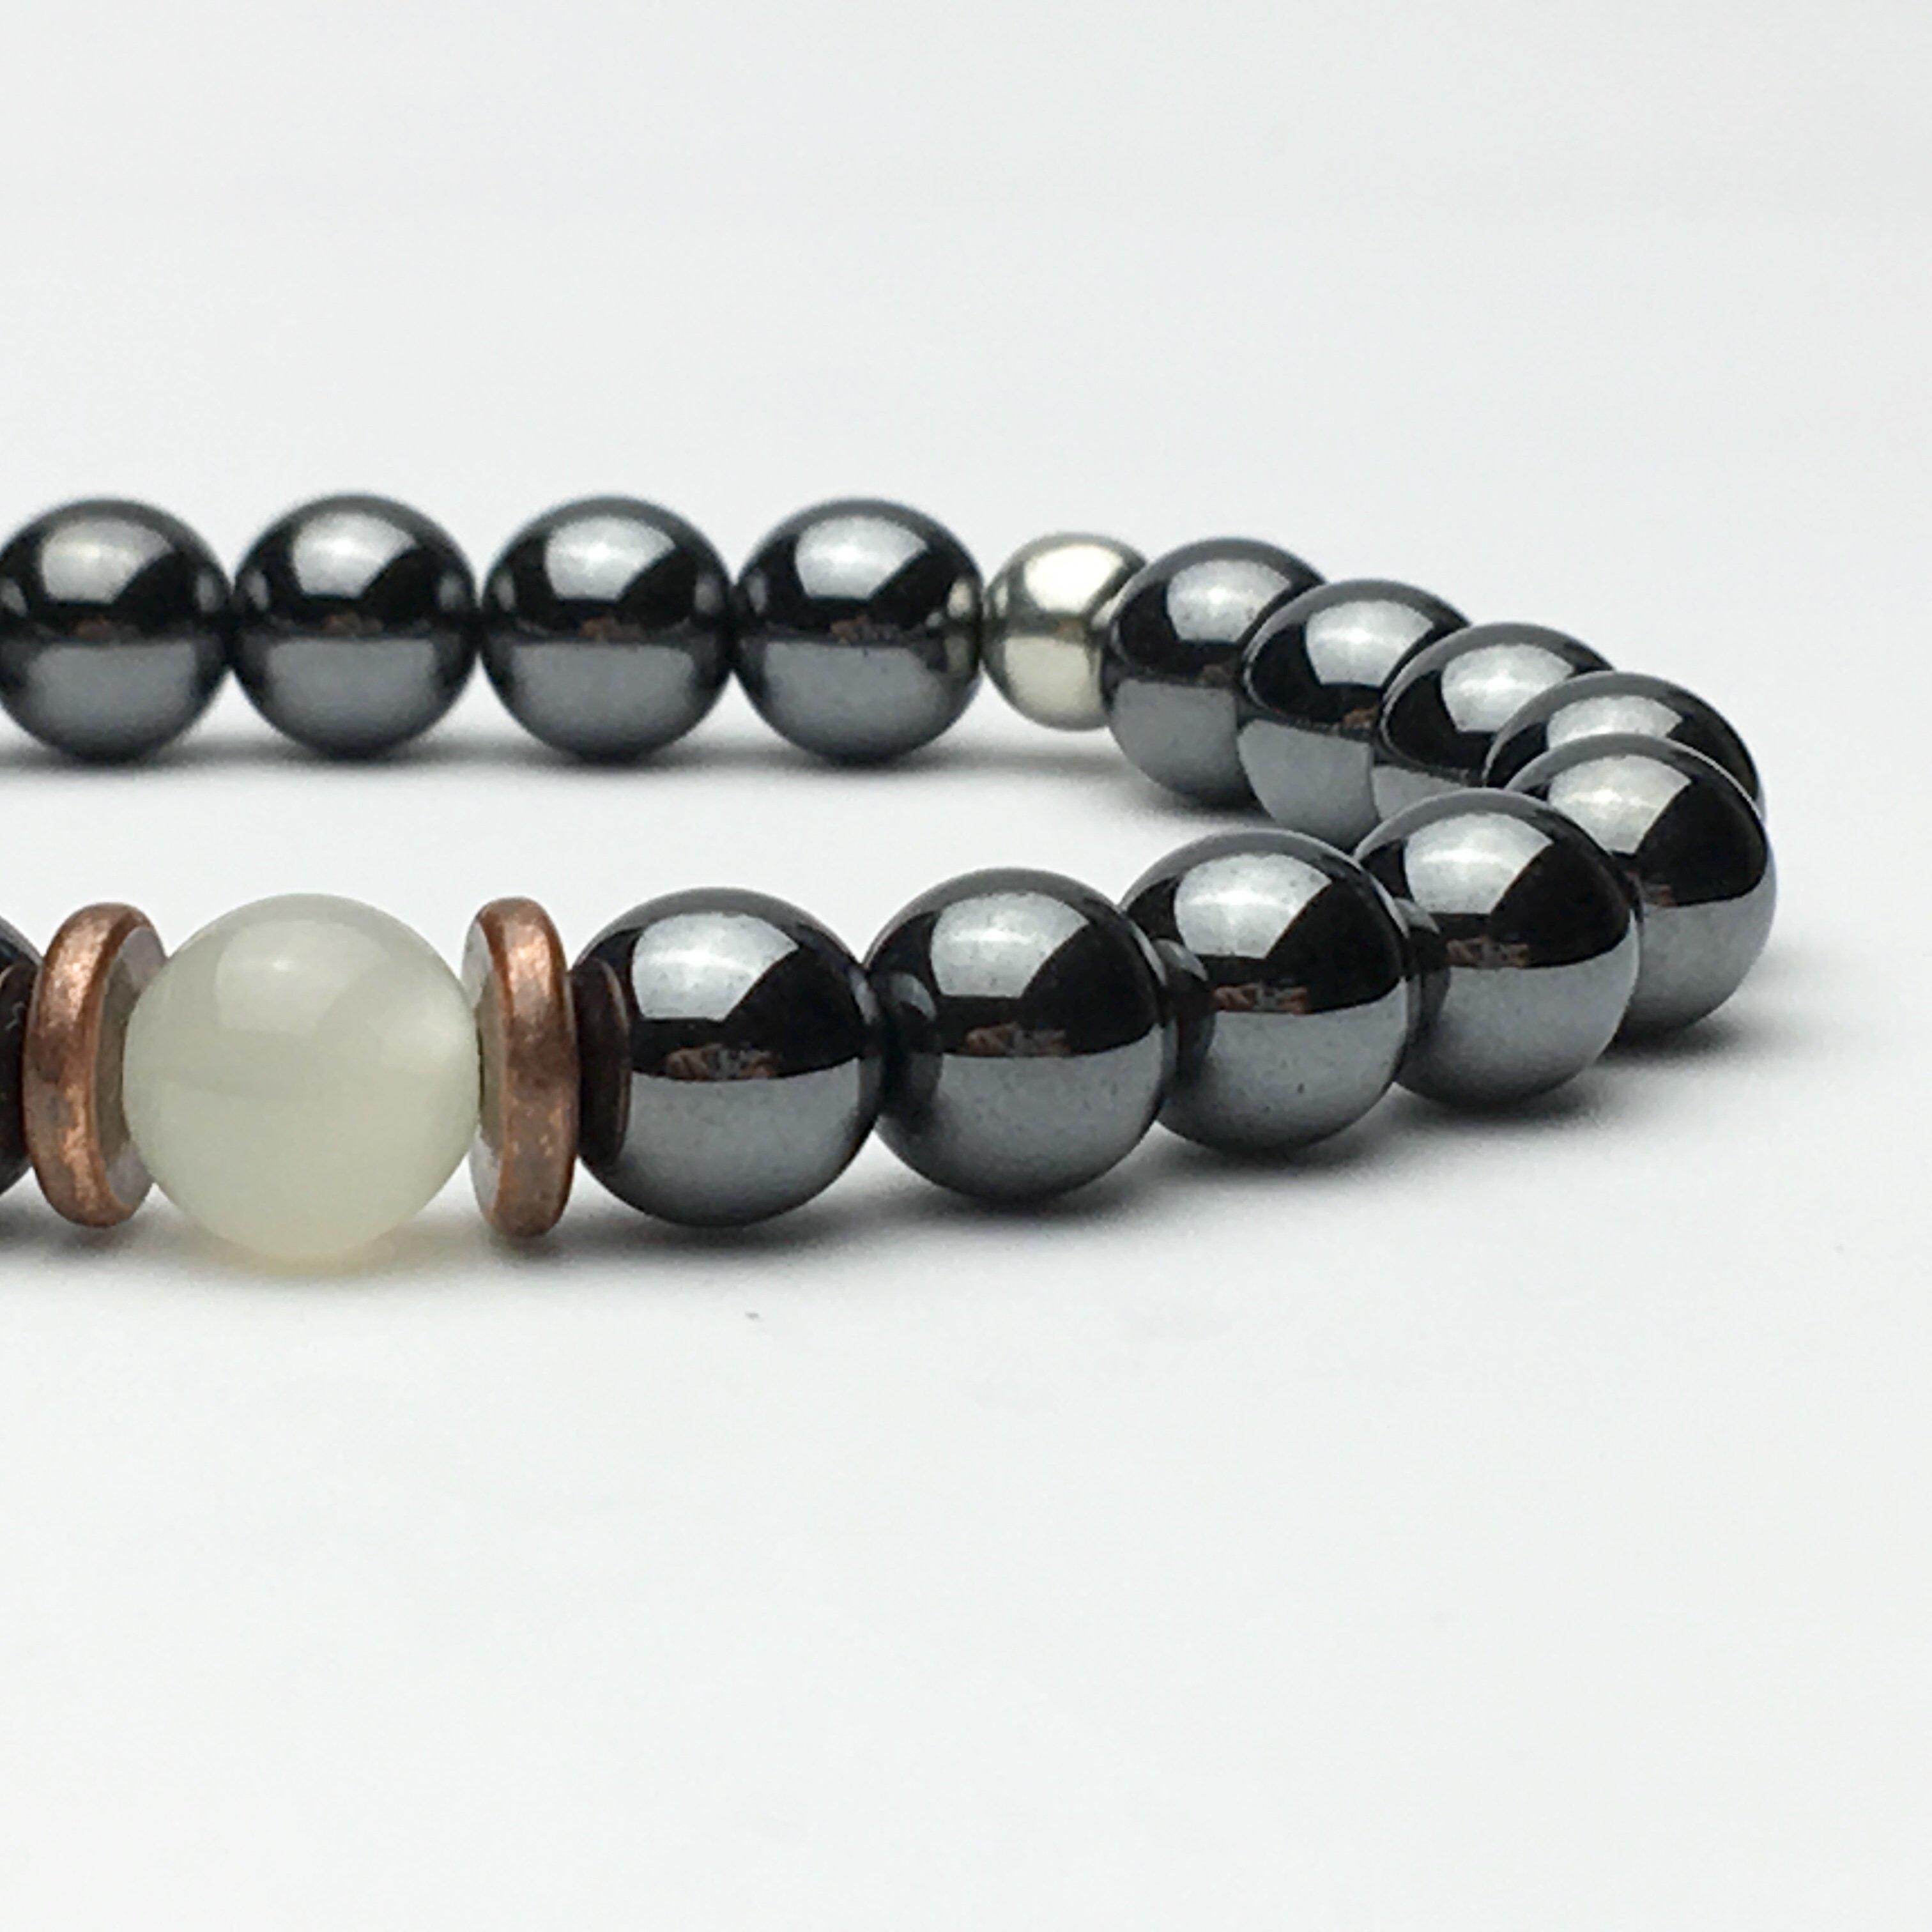 Hematite and Moonstone Beaded Bracelet